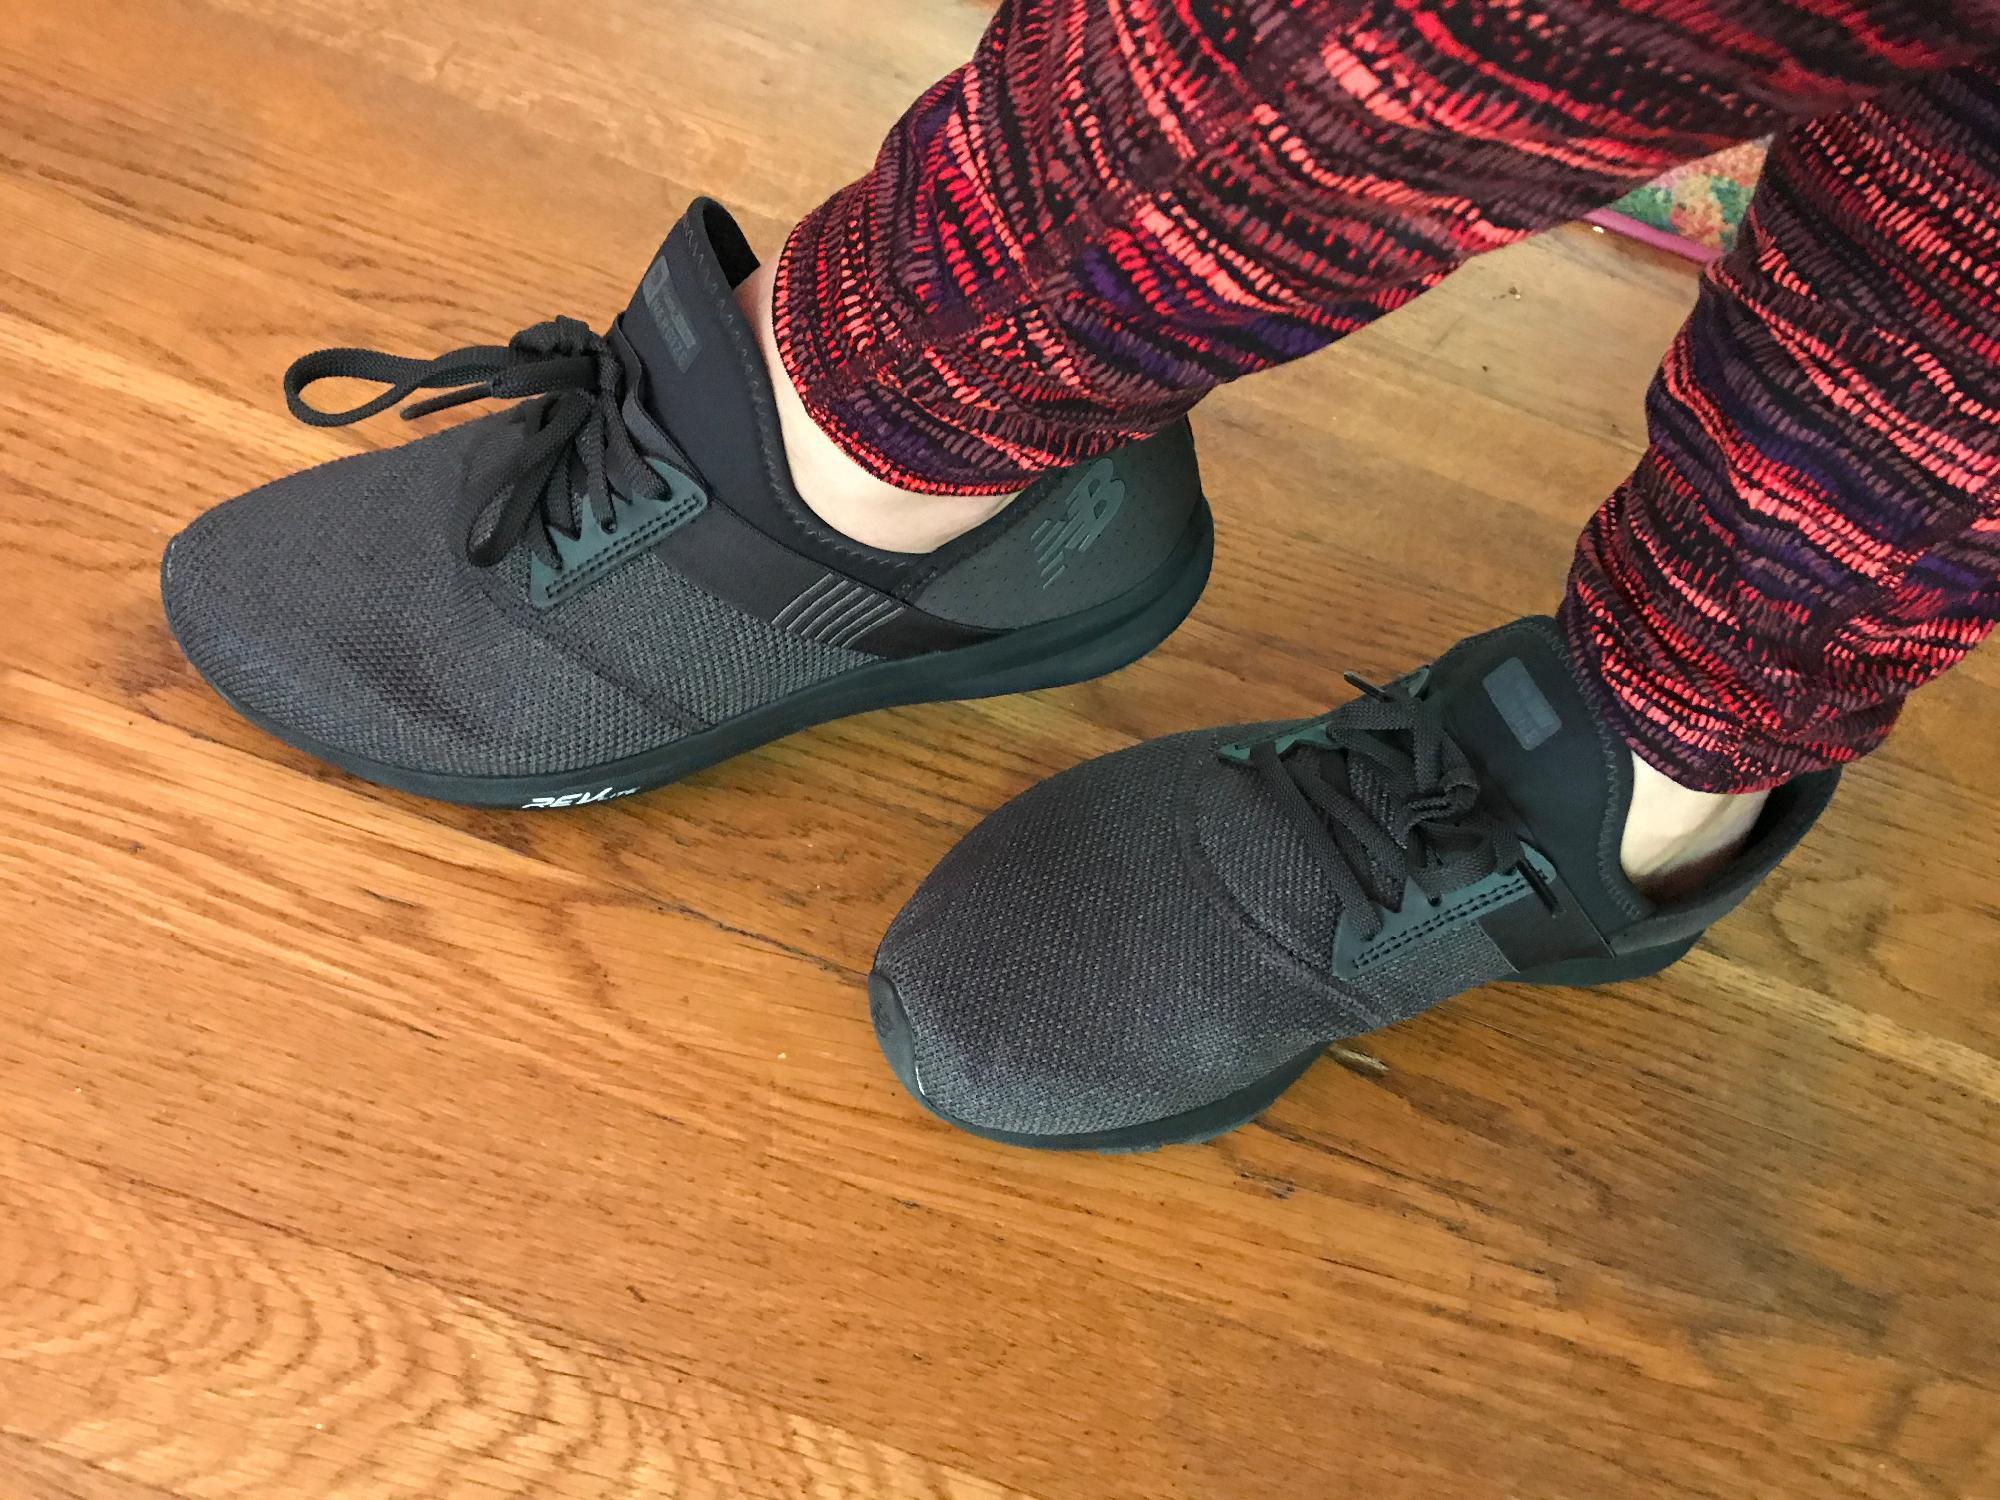 New Balance New Balance FuelCore NERGIZE (OvercastWhite) Women's Cross Training Shoes from Zappos | myweddingShop